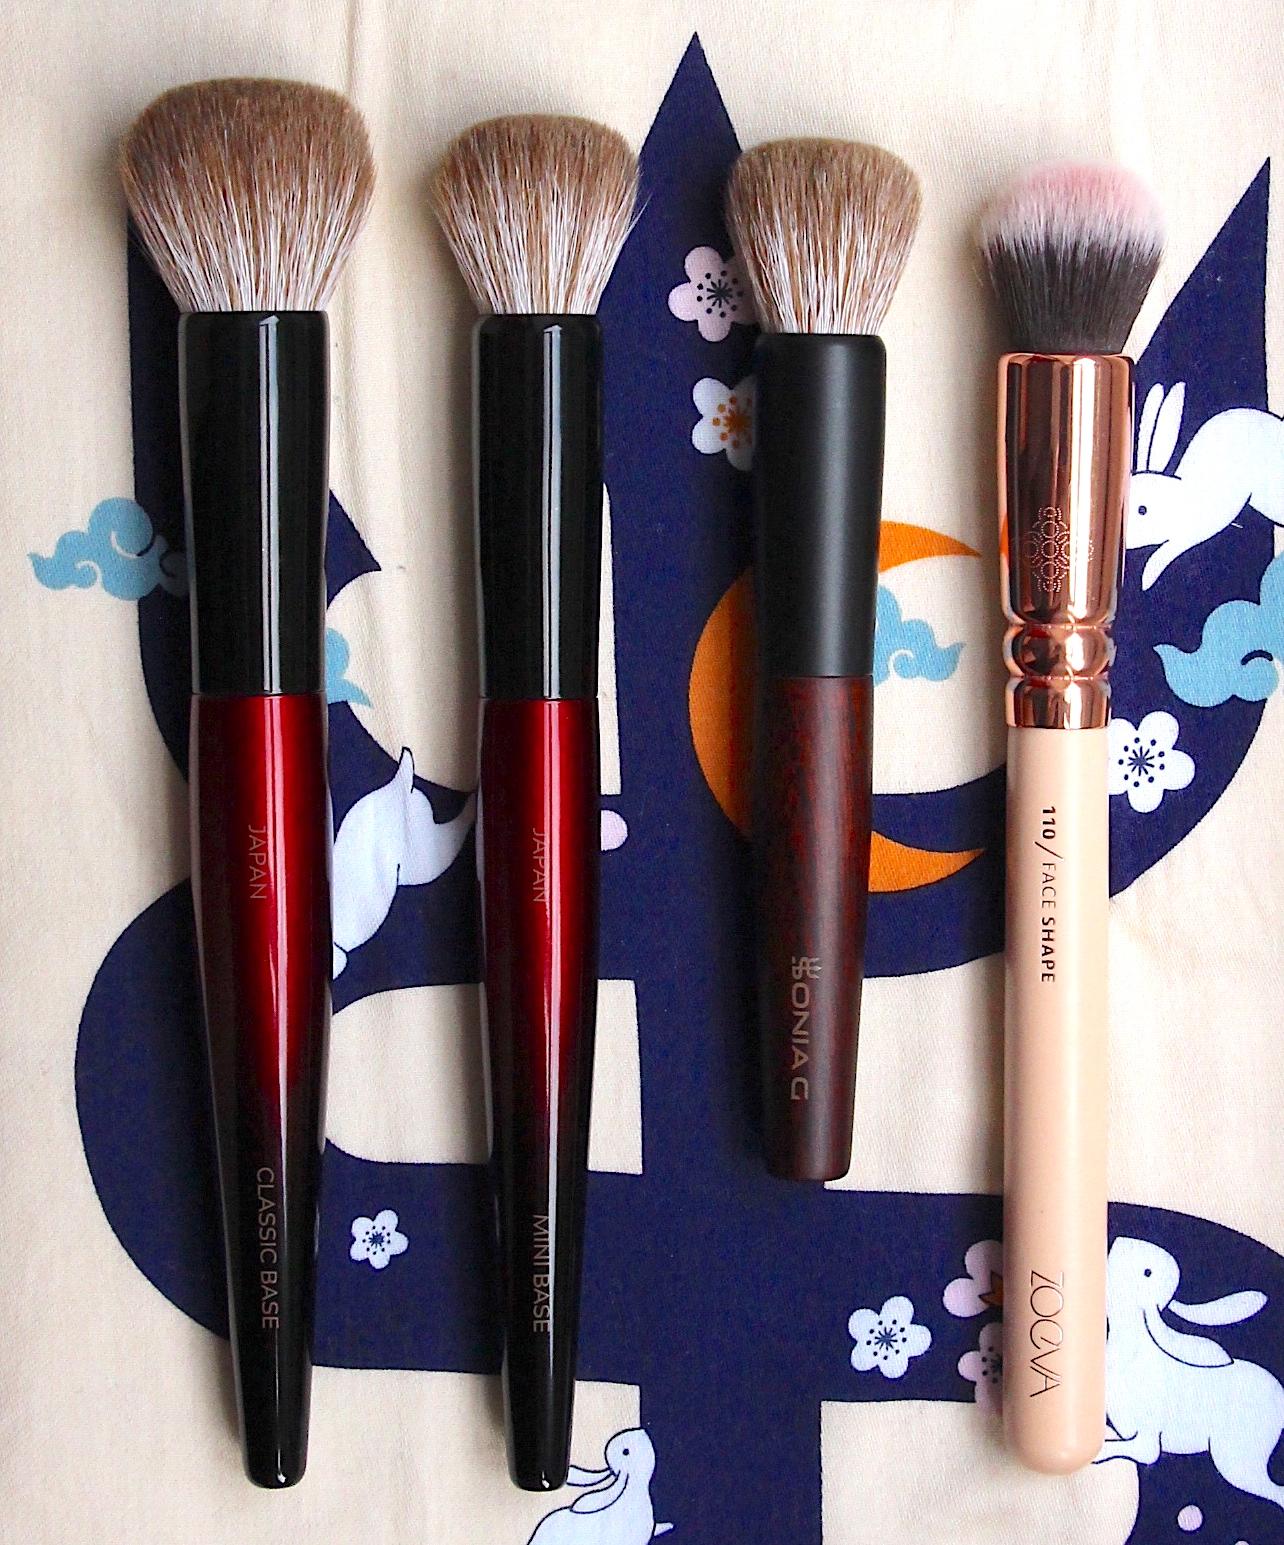 Sonia G Fusion Series base brush comparisons. Classic Base, Mini Base, Keyaki Mini Base, Zoeva 110